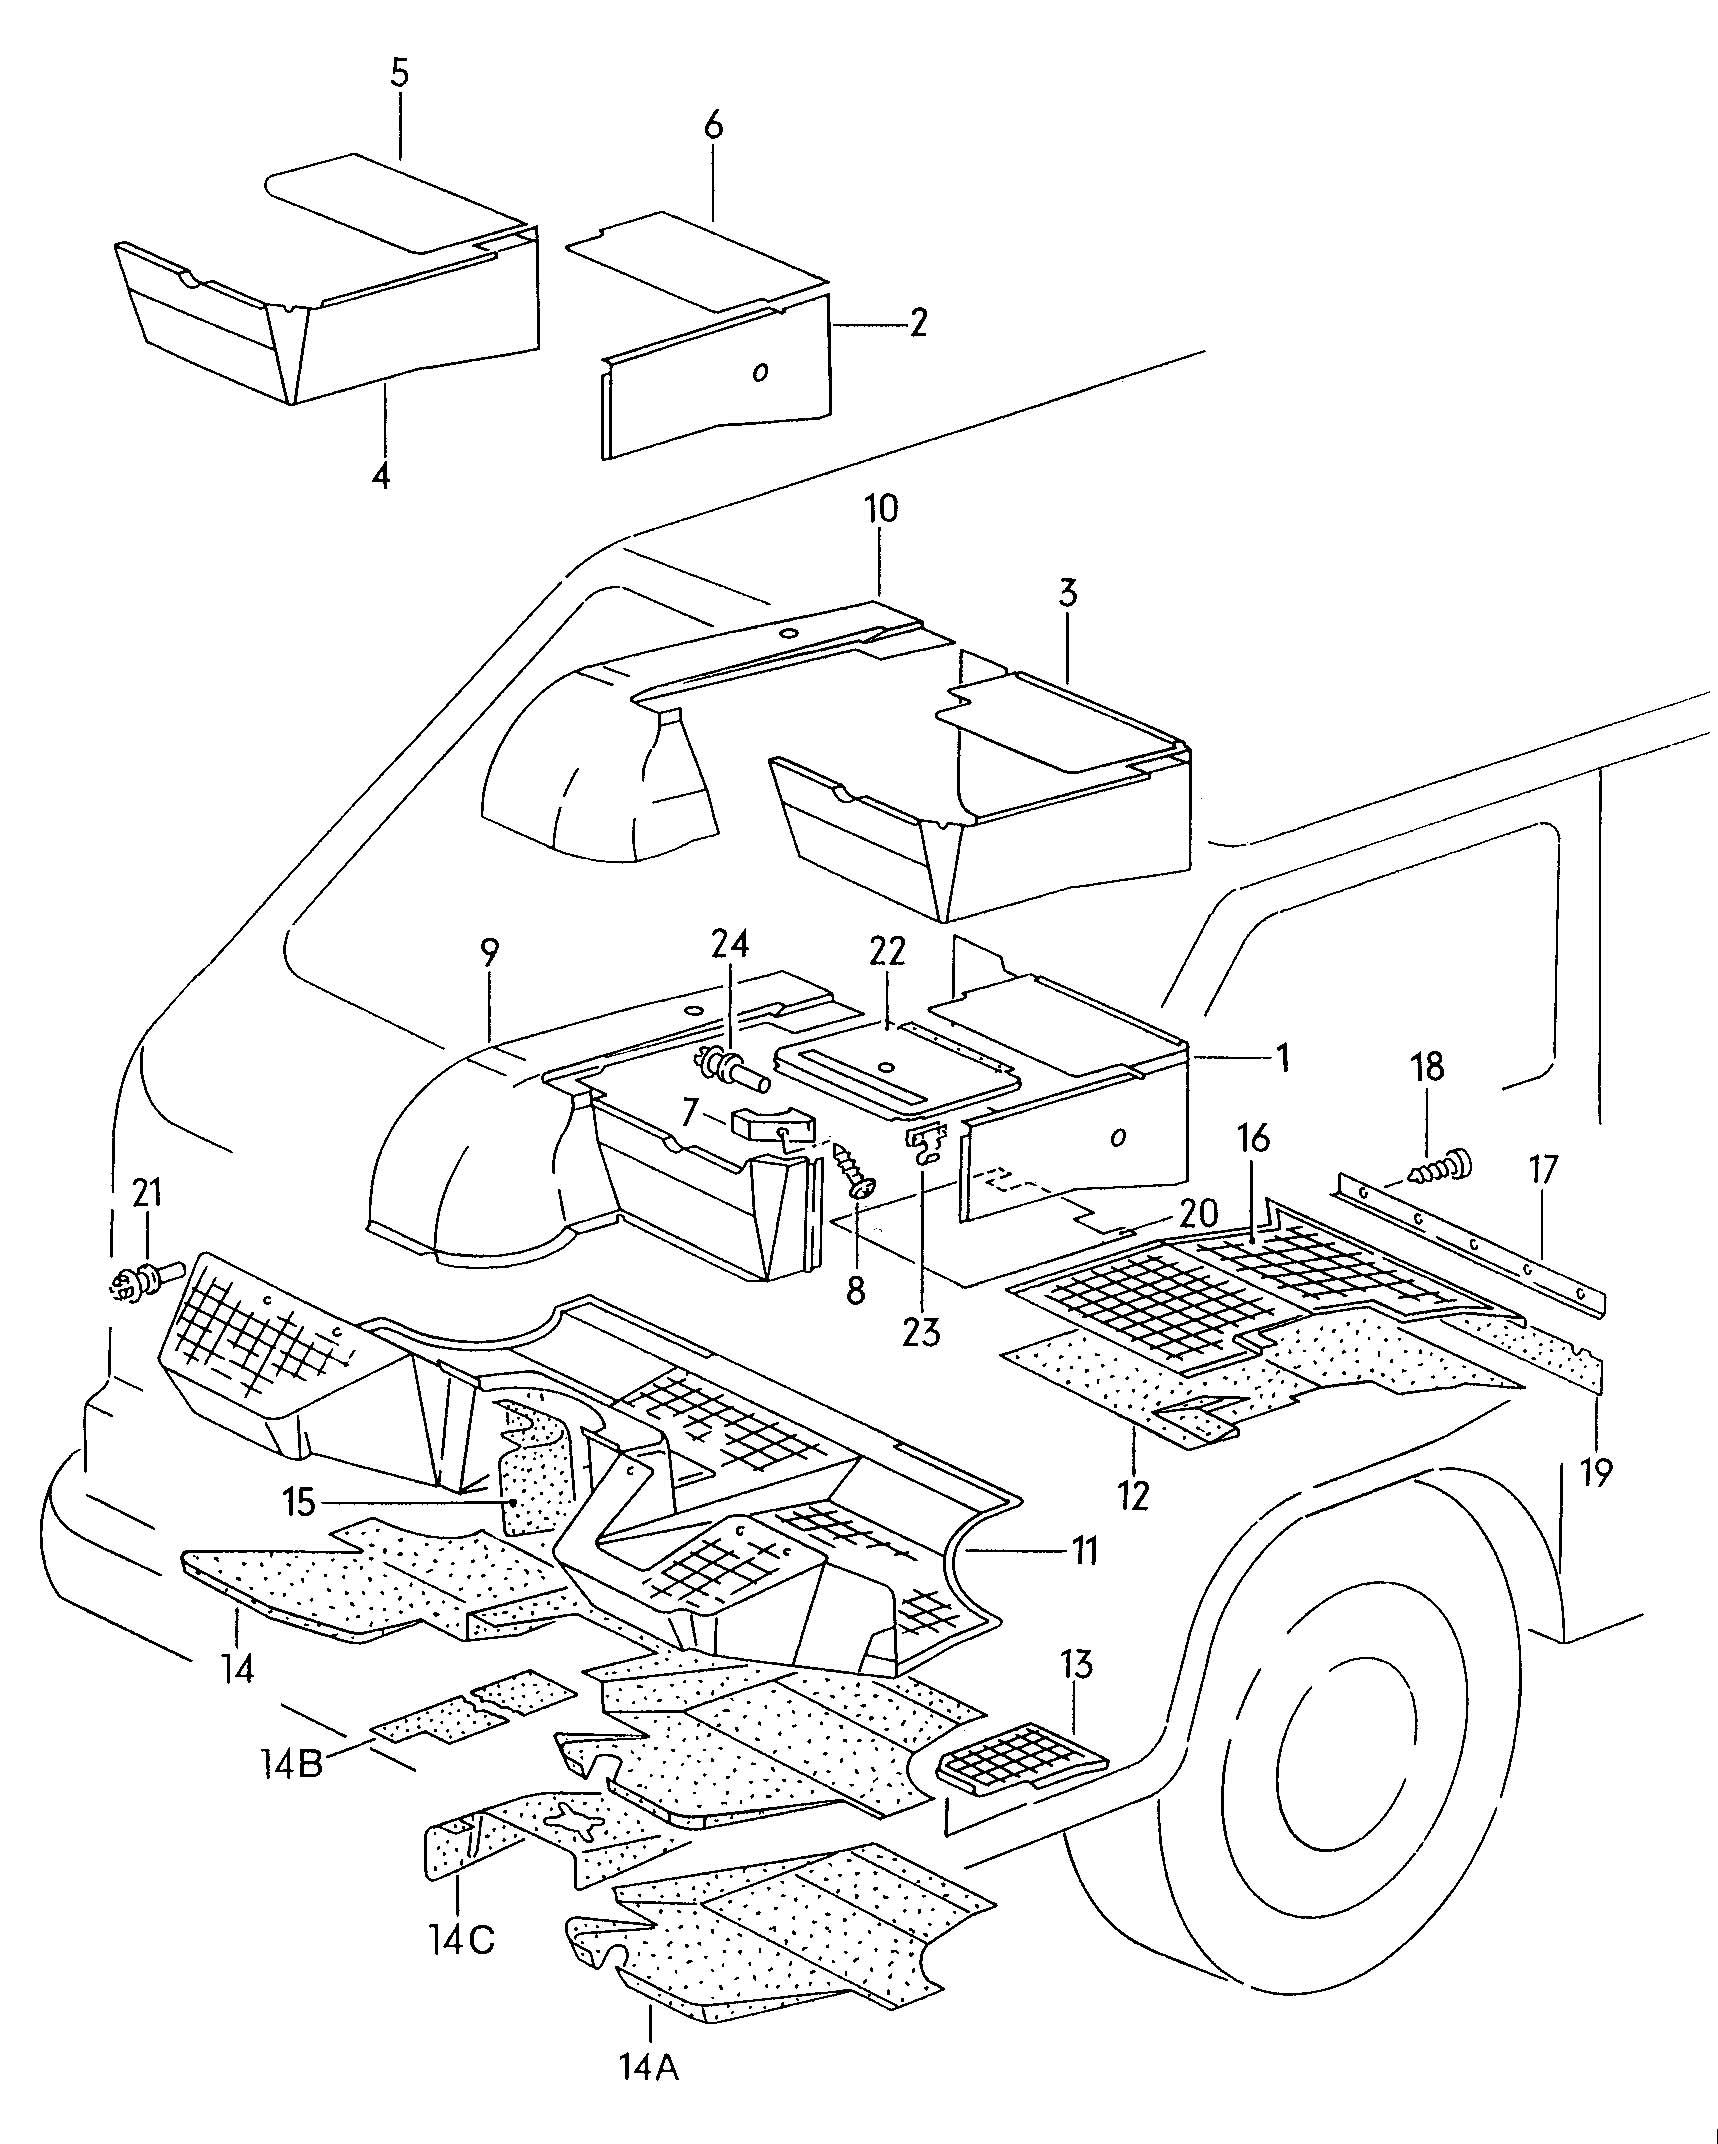 Porsche Boxster Wiring Diagram Manual Download